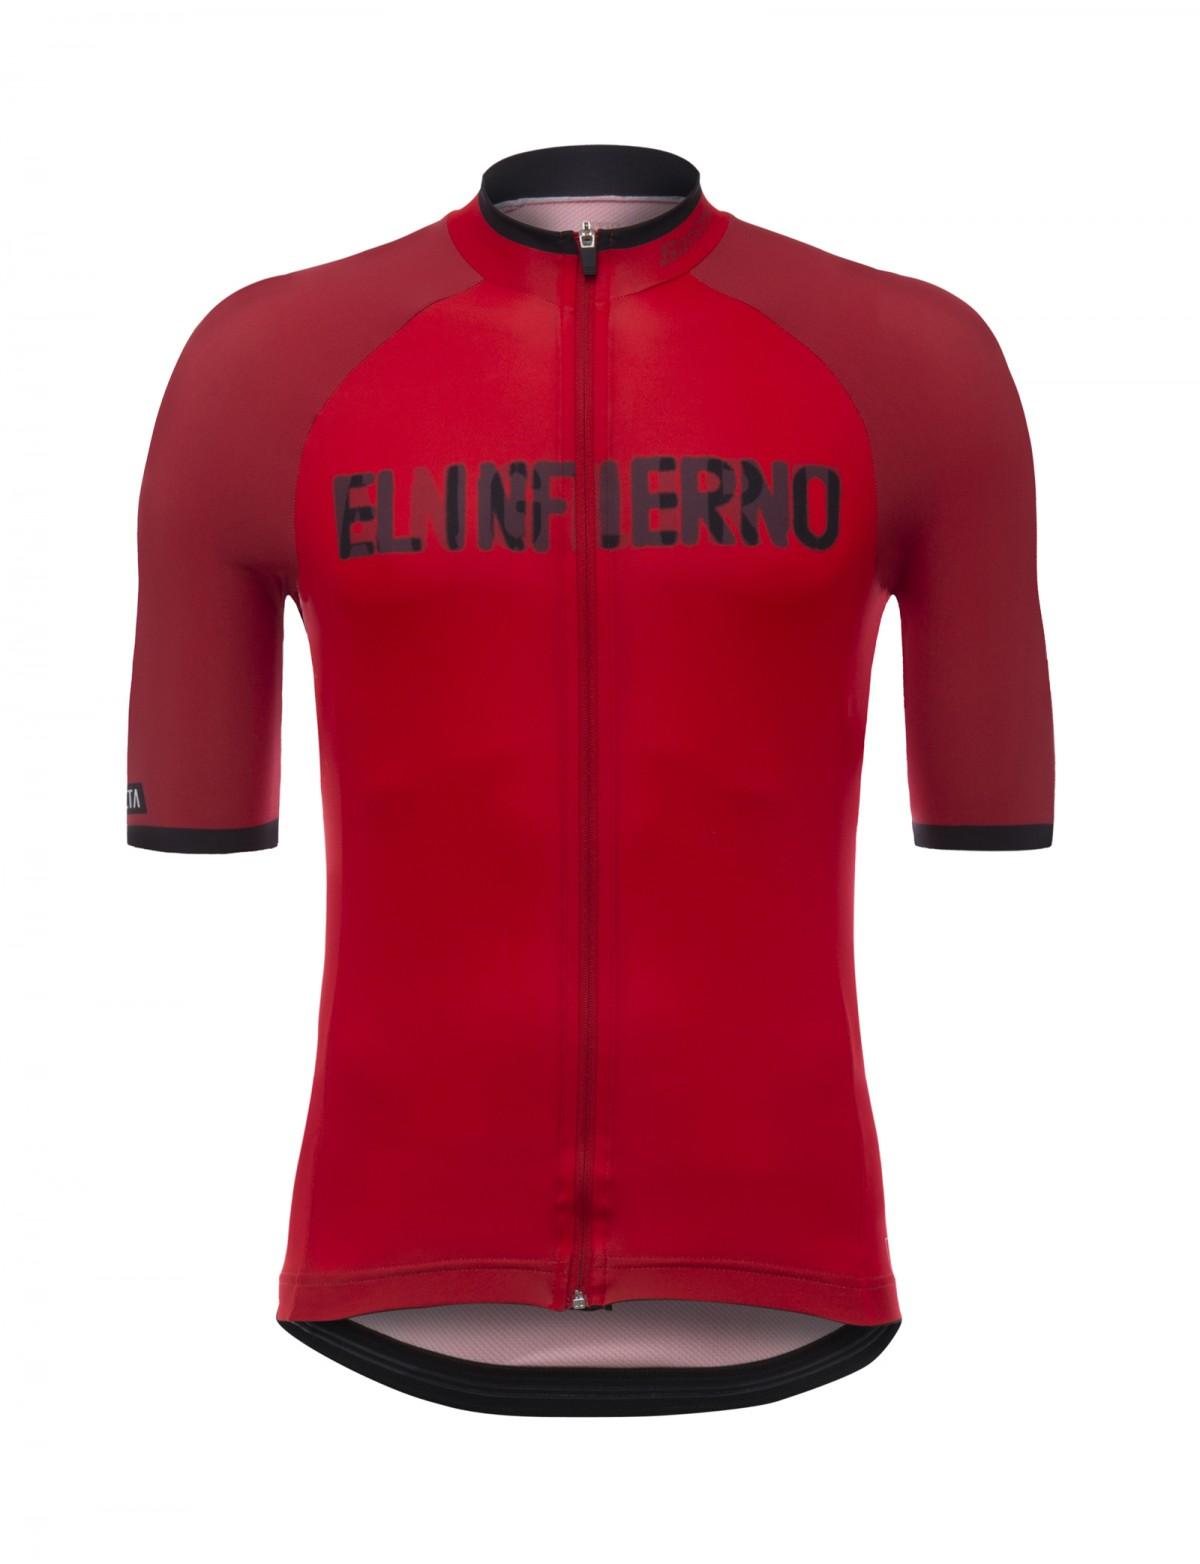 Vuelta maglia angliru